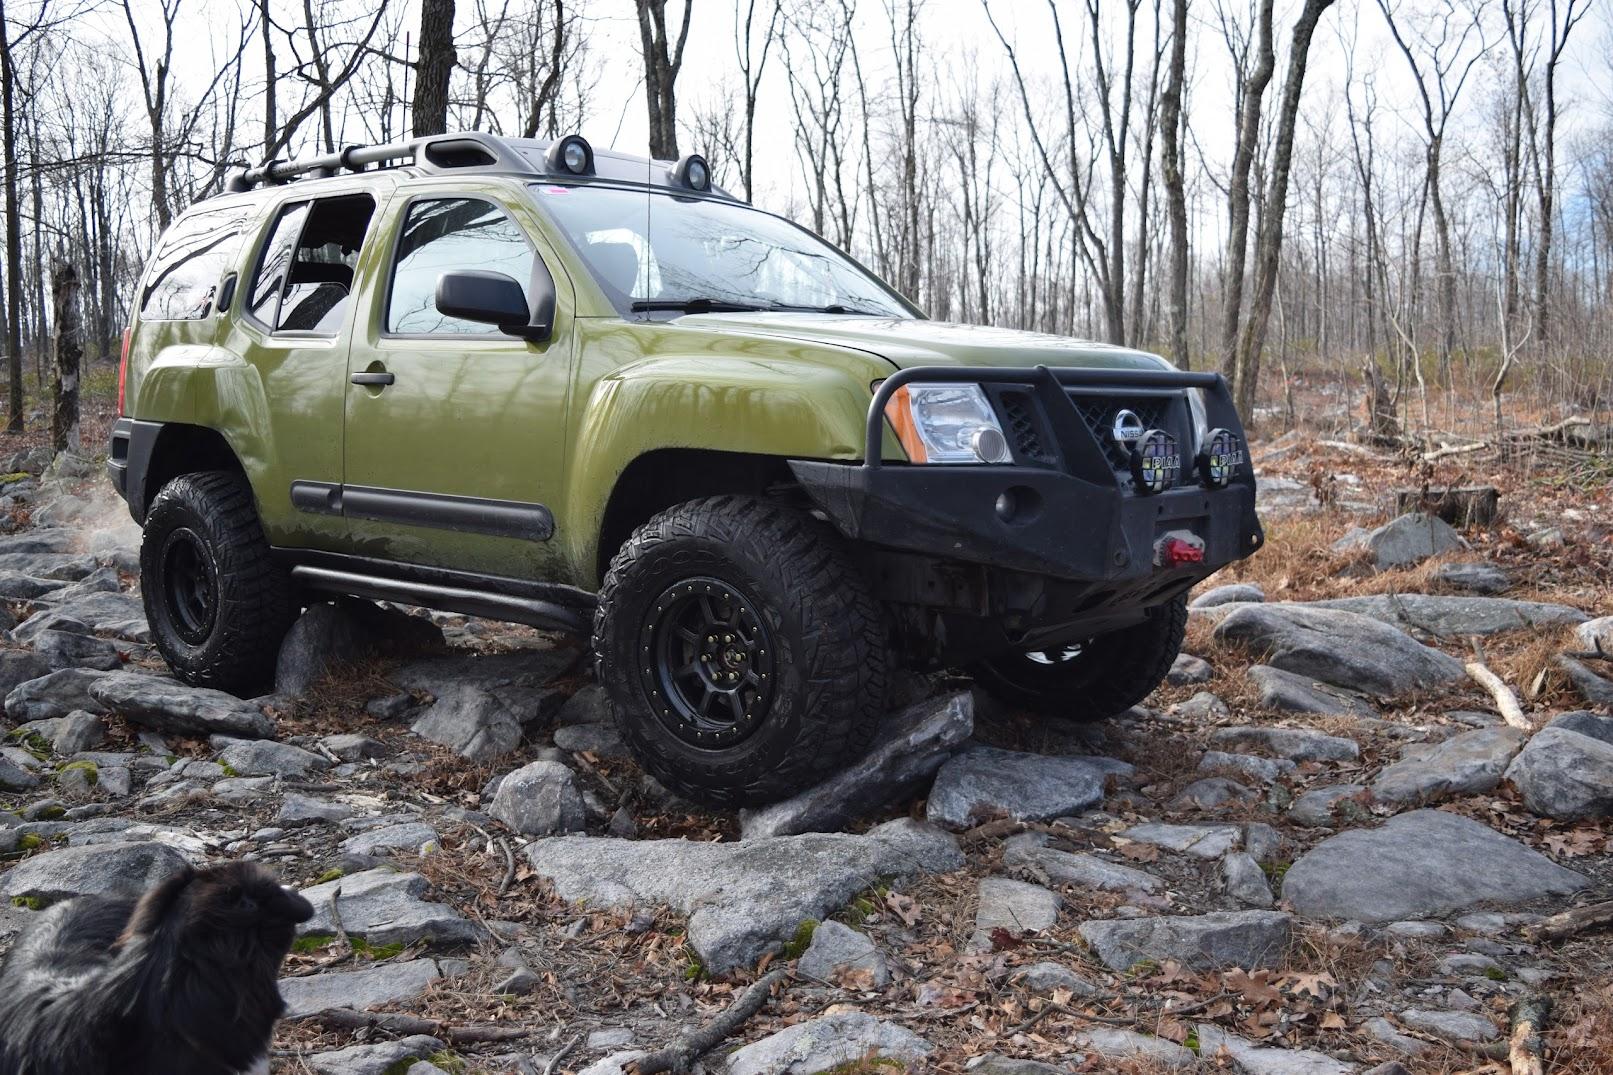 255 85r16 Tires >> 255/85r16 vs 285/75r16 - Experience? - Second Generation Nissan Xterra Forums (2005+)